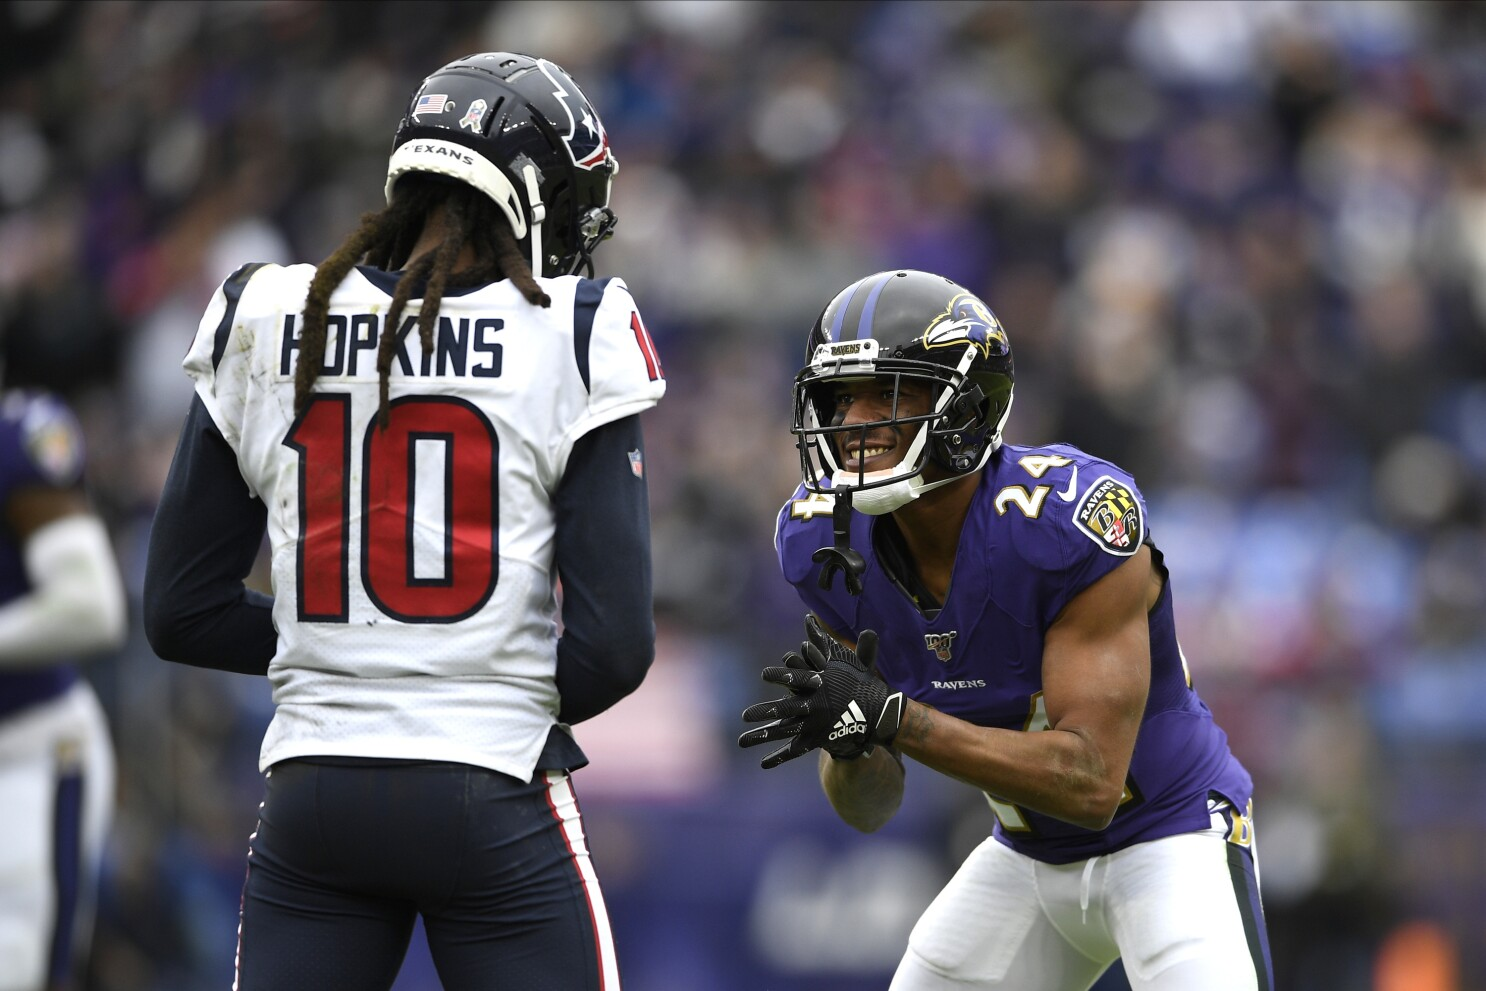 Column: Shrewd Ravens look like legit Super Bowl contender